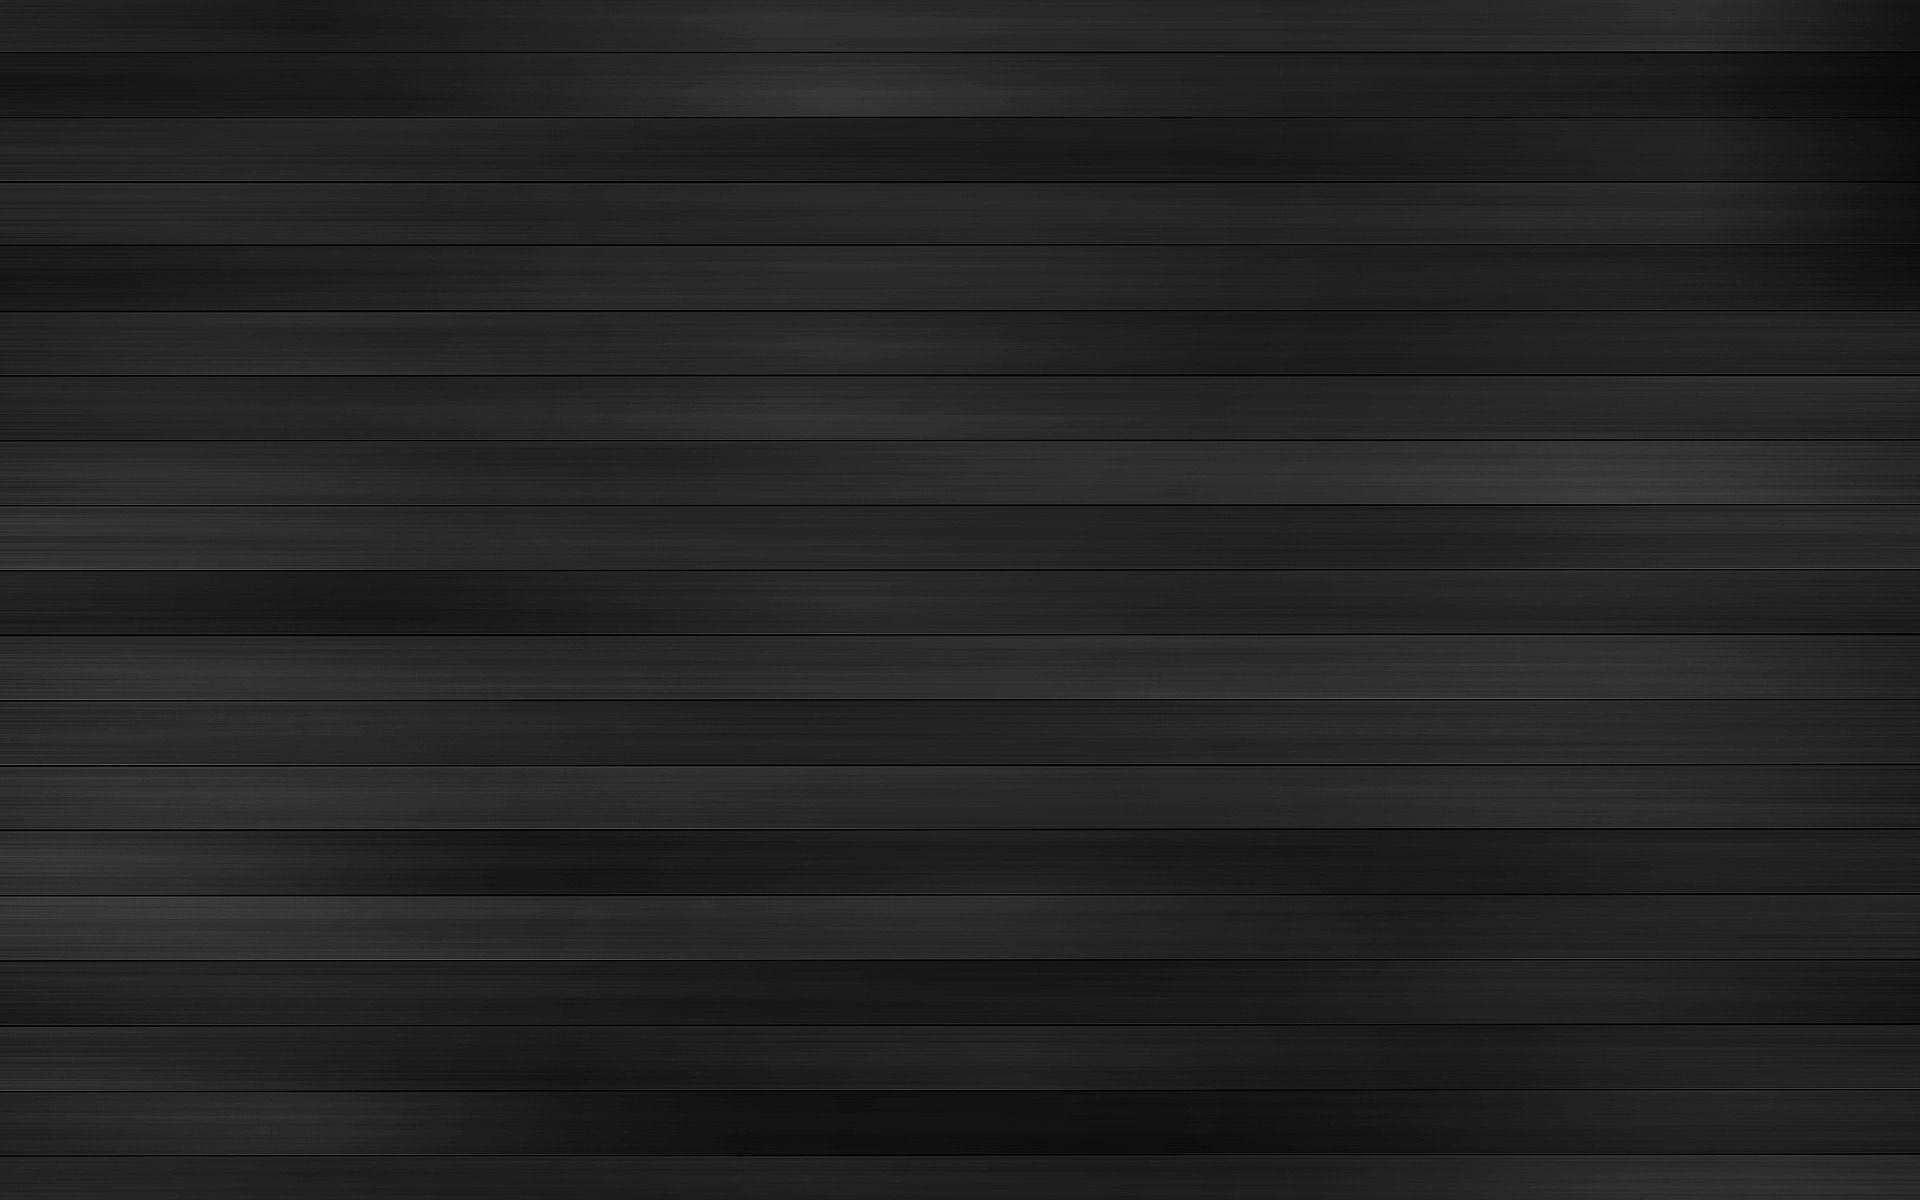 Dark gray wallpaper 74 images - Light and dark grey wallpaper ...